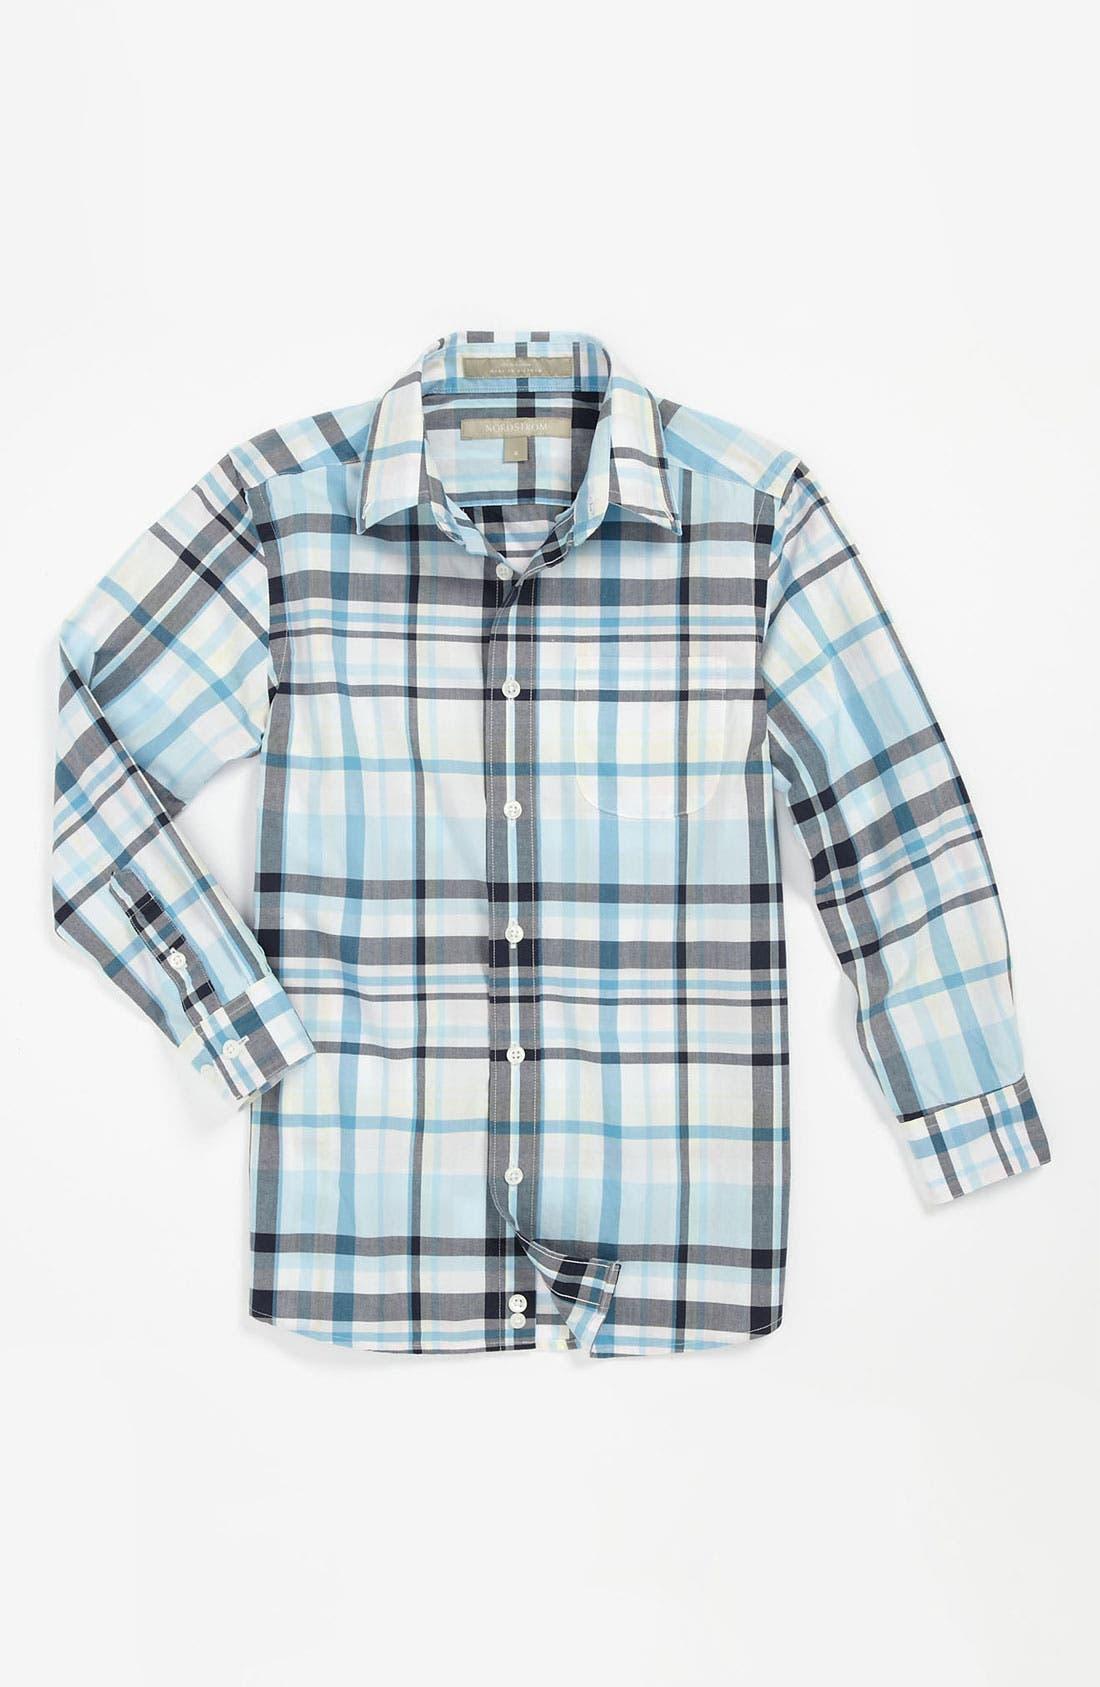 Alternate Image 1 Selected - Nordstrom Check Dress Shirt (Toddler)